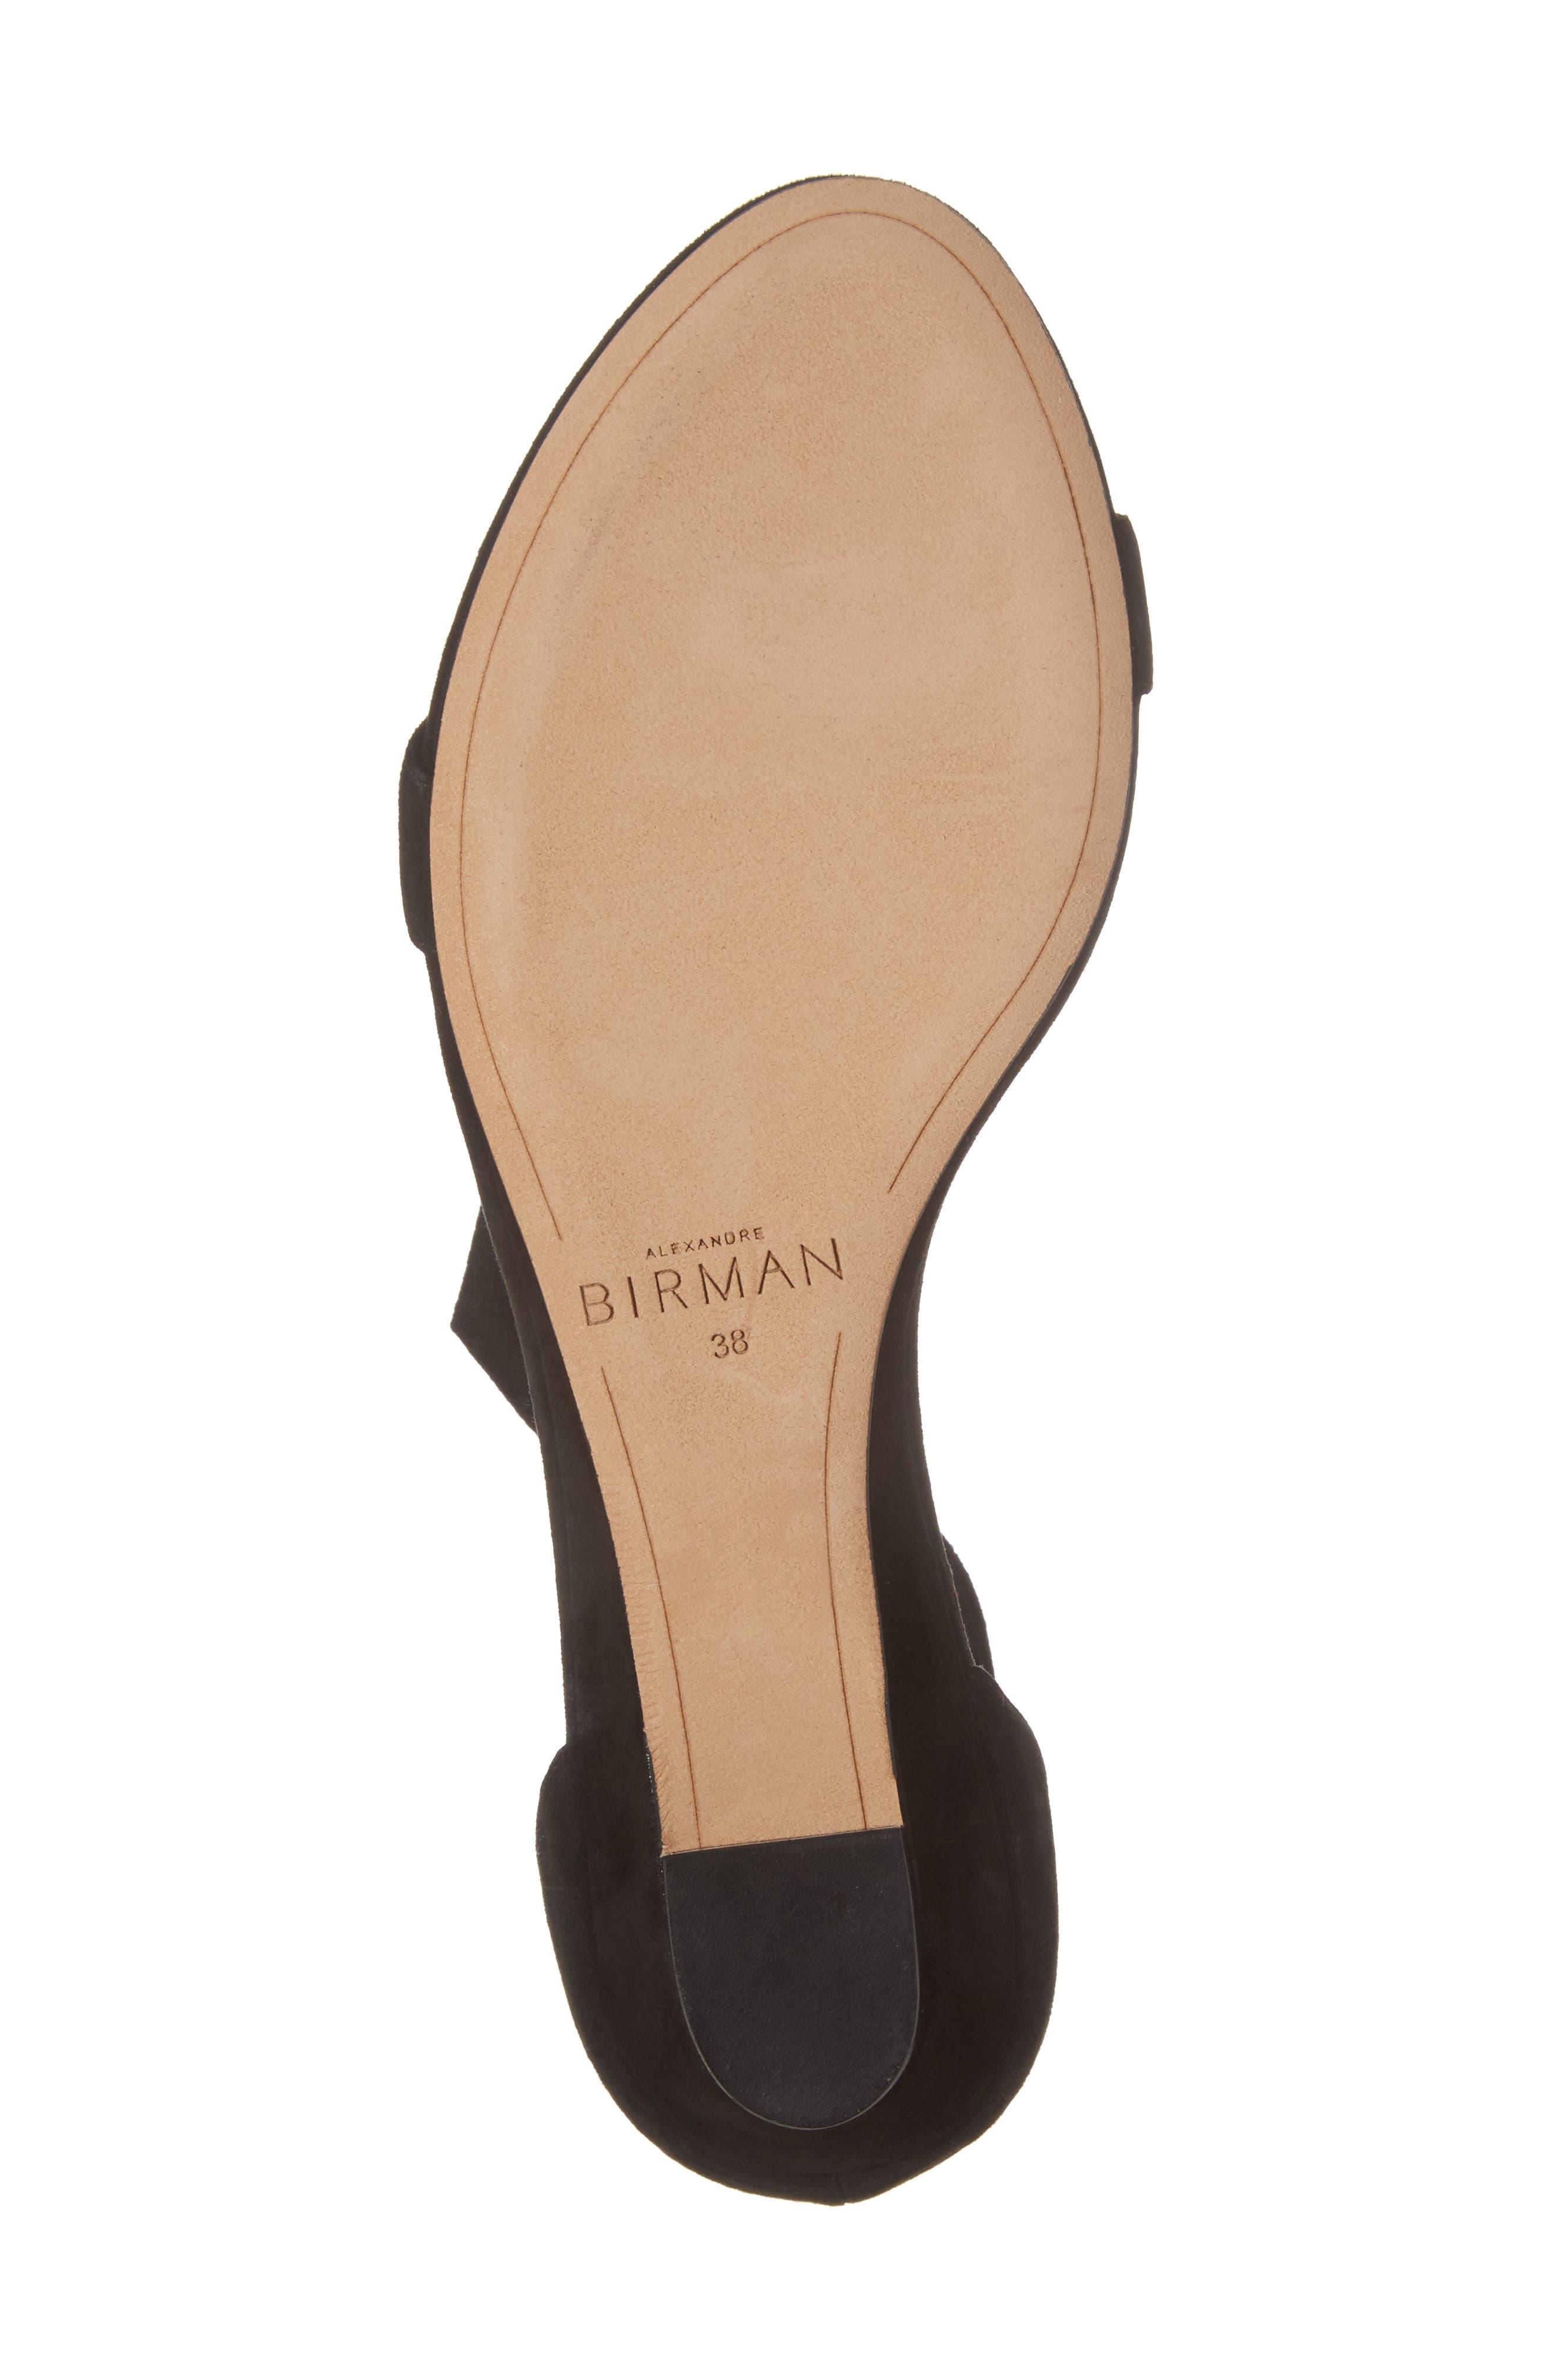 Atena Tie Strap Wedge Sandal,                             Alternate thumbnail 6, color,                             001